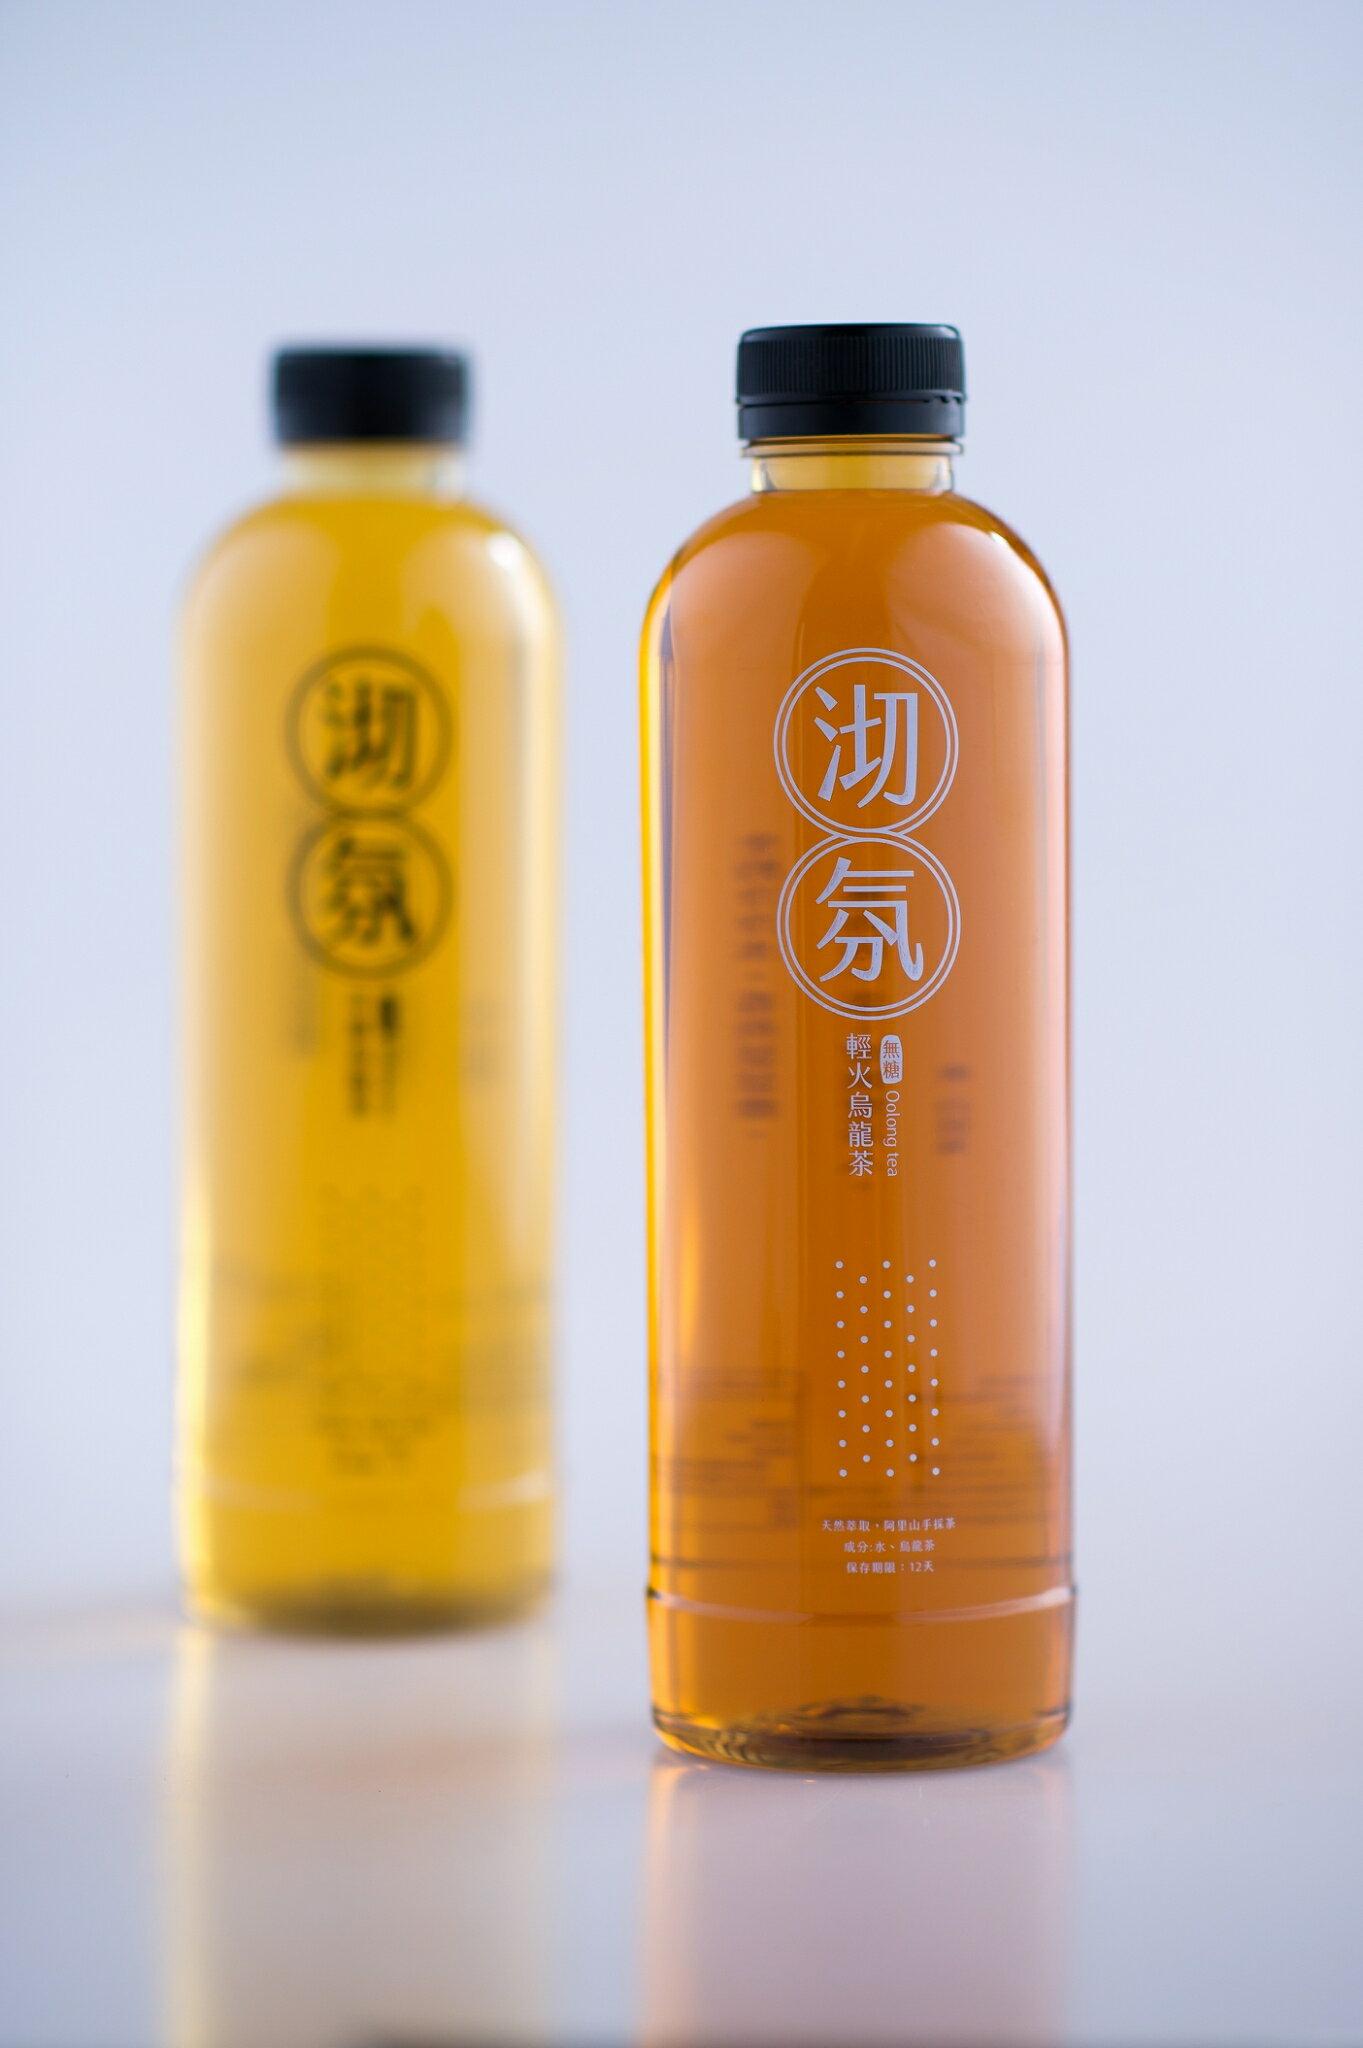 <br/><br/>  沏氛免運94讚  《沏氛》歡樂分享瓶(1000C.C)-20瓶裝, 口味可依喜愛搭配(輕火烏龍茶、淬綠烏龍茶)<br/><br/>